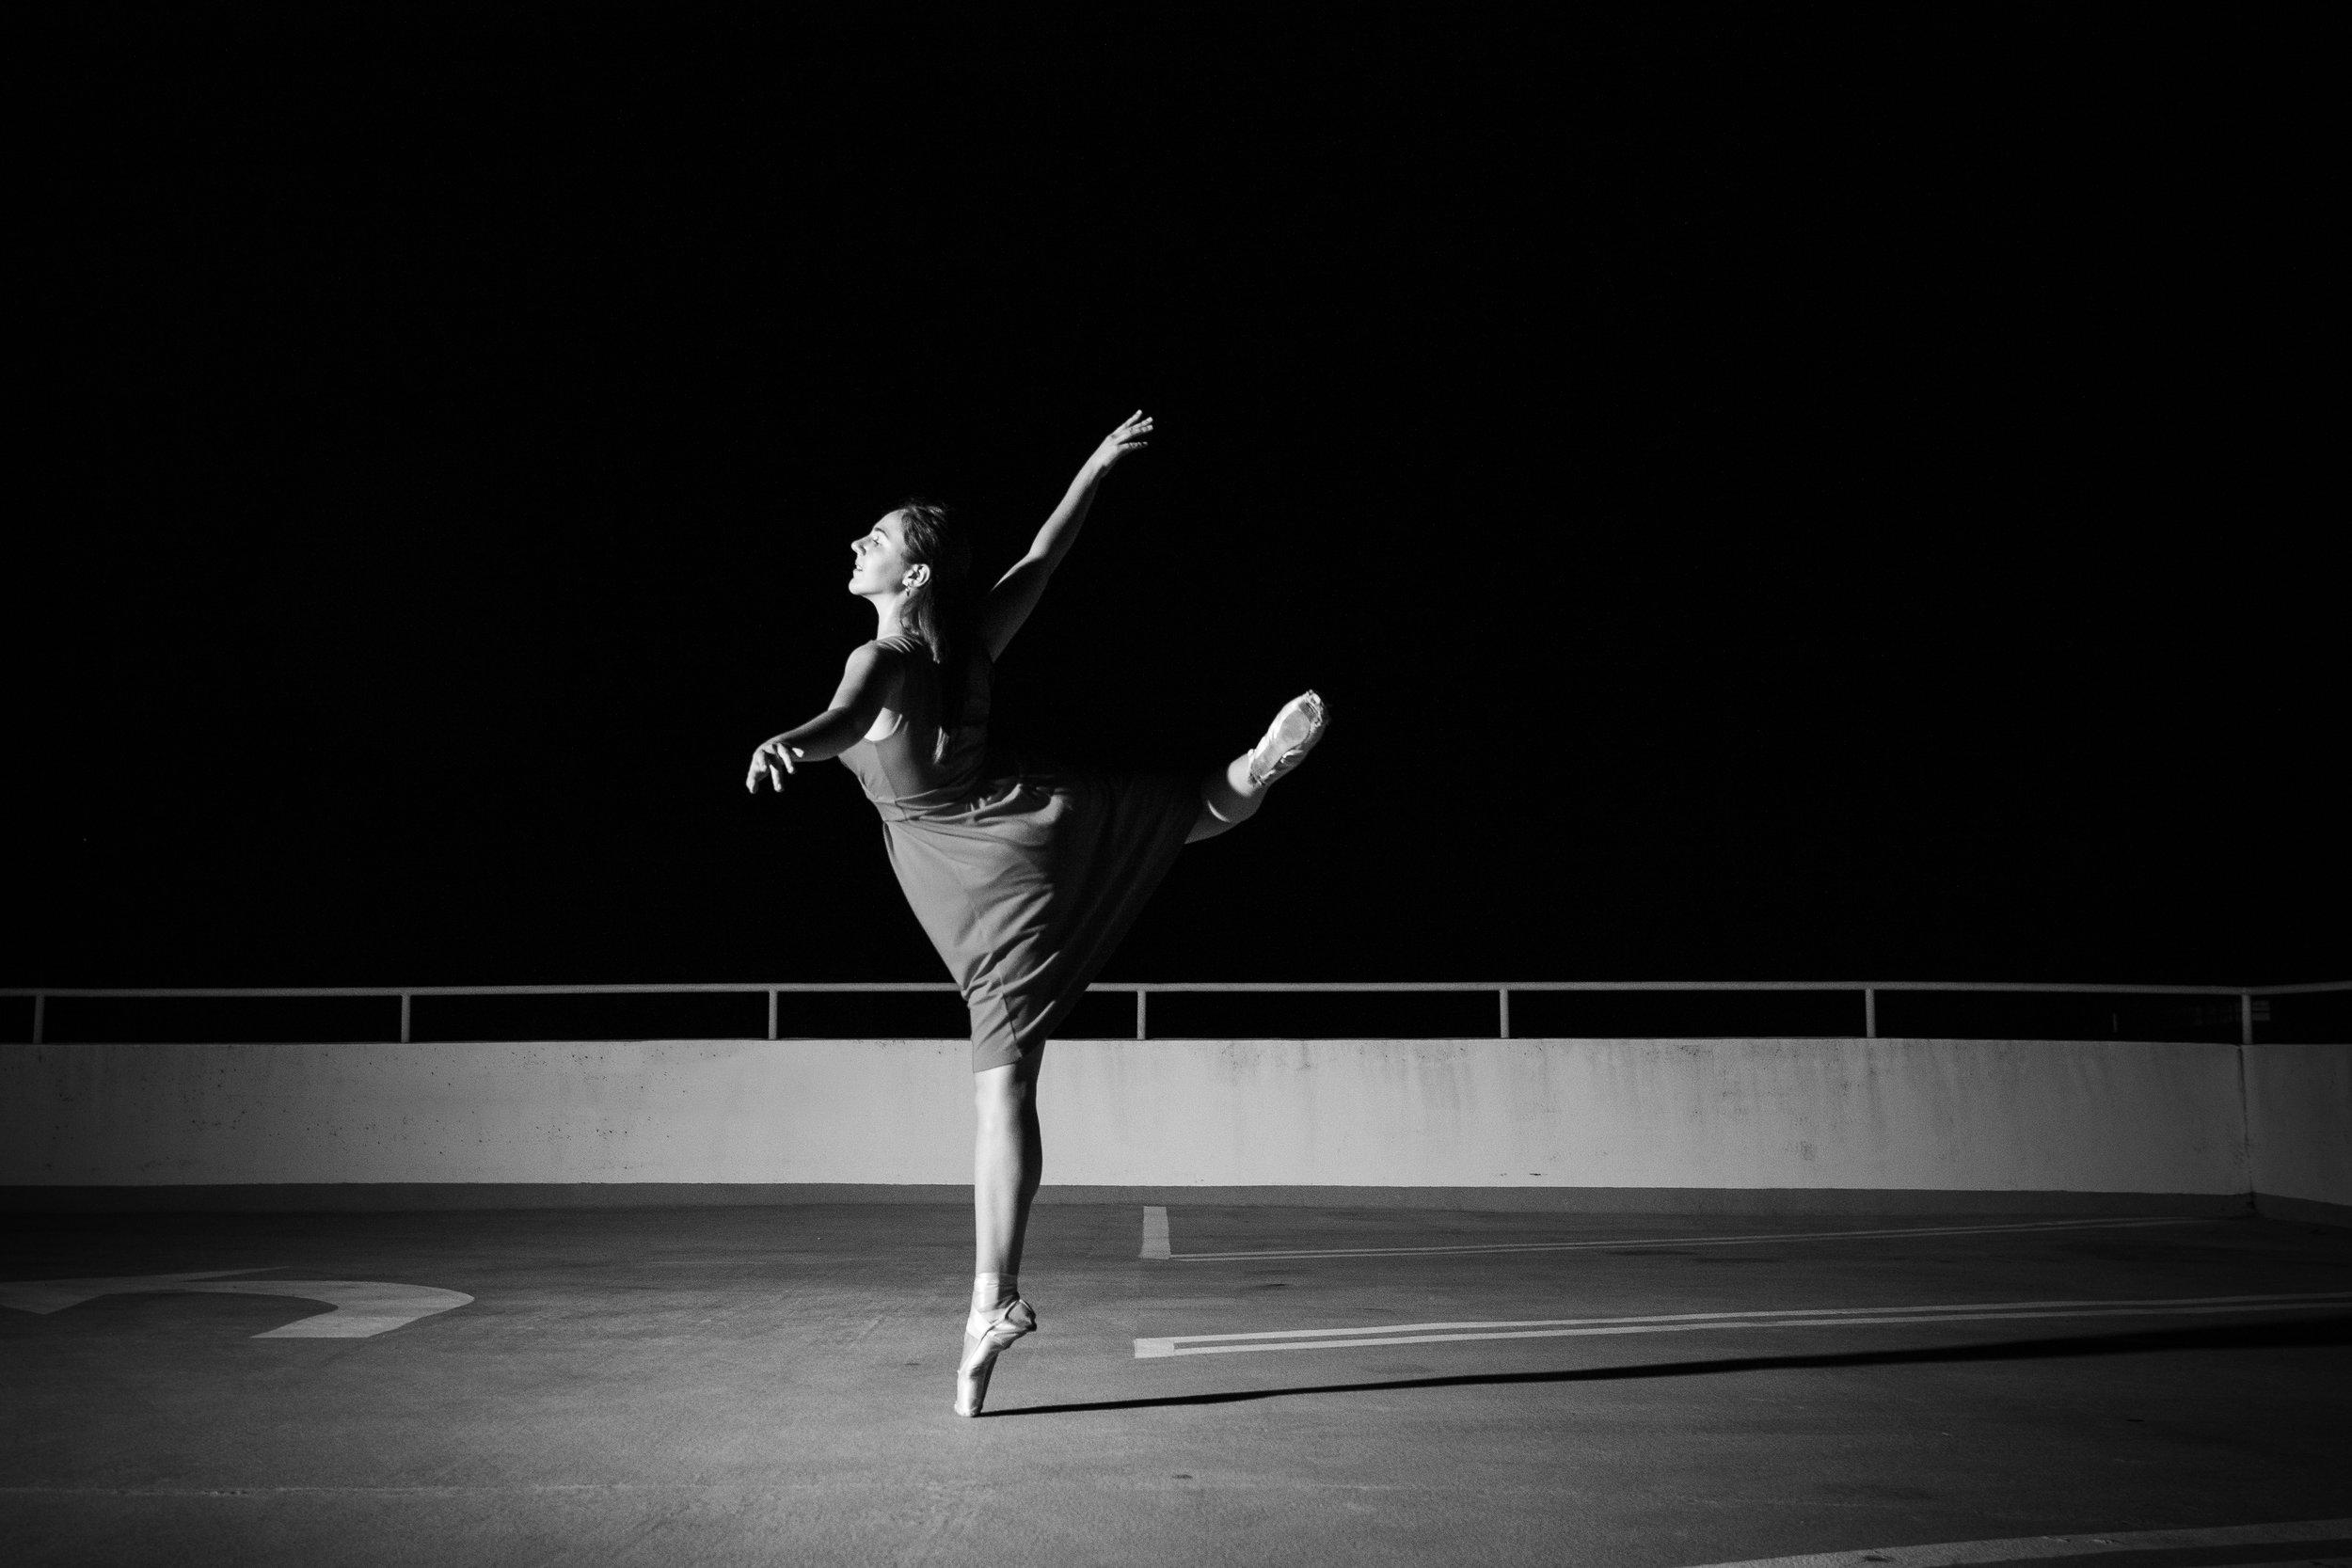 2016_07_28_anne_talkington_durham_dances_ballet_corcoran-320.jpg